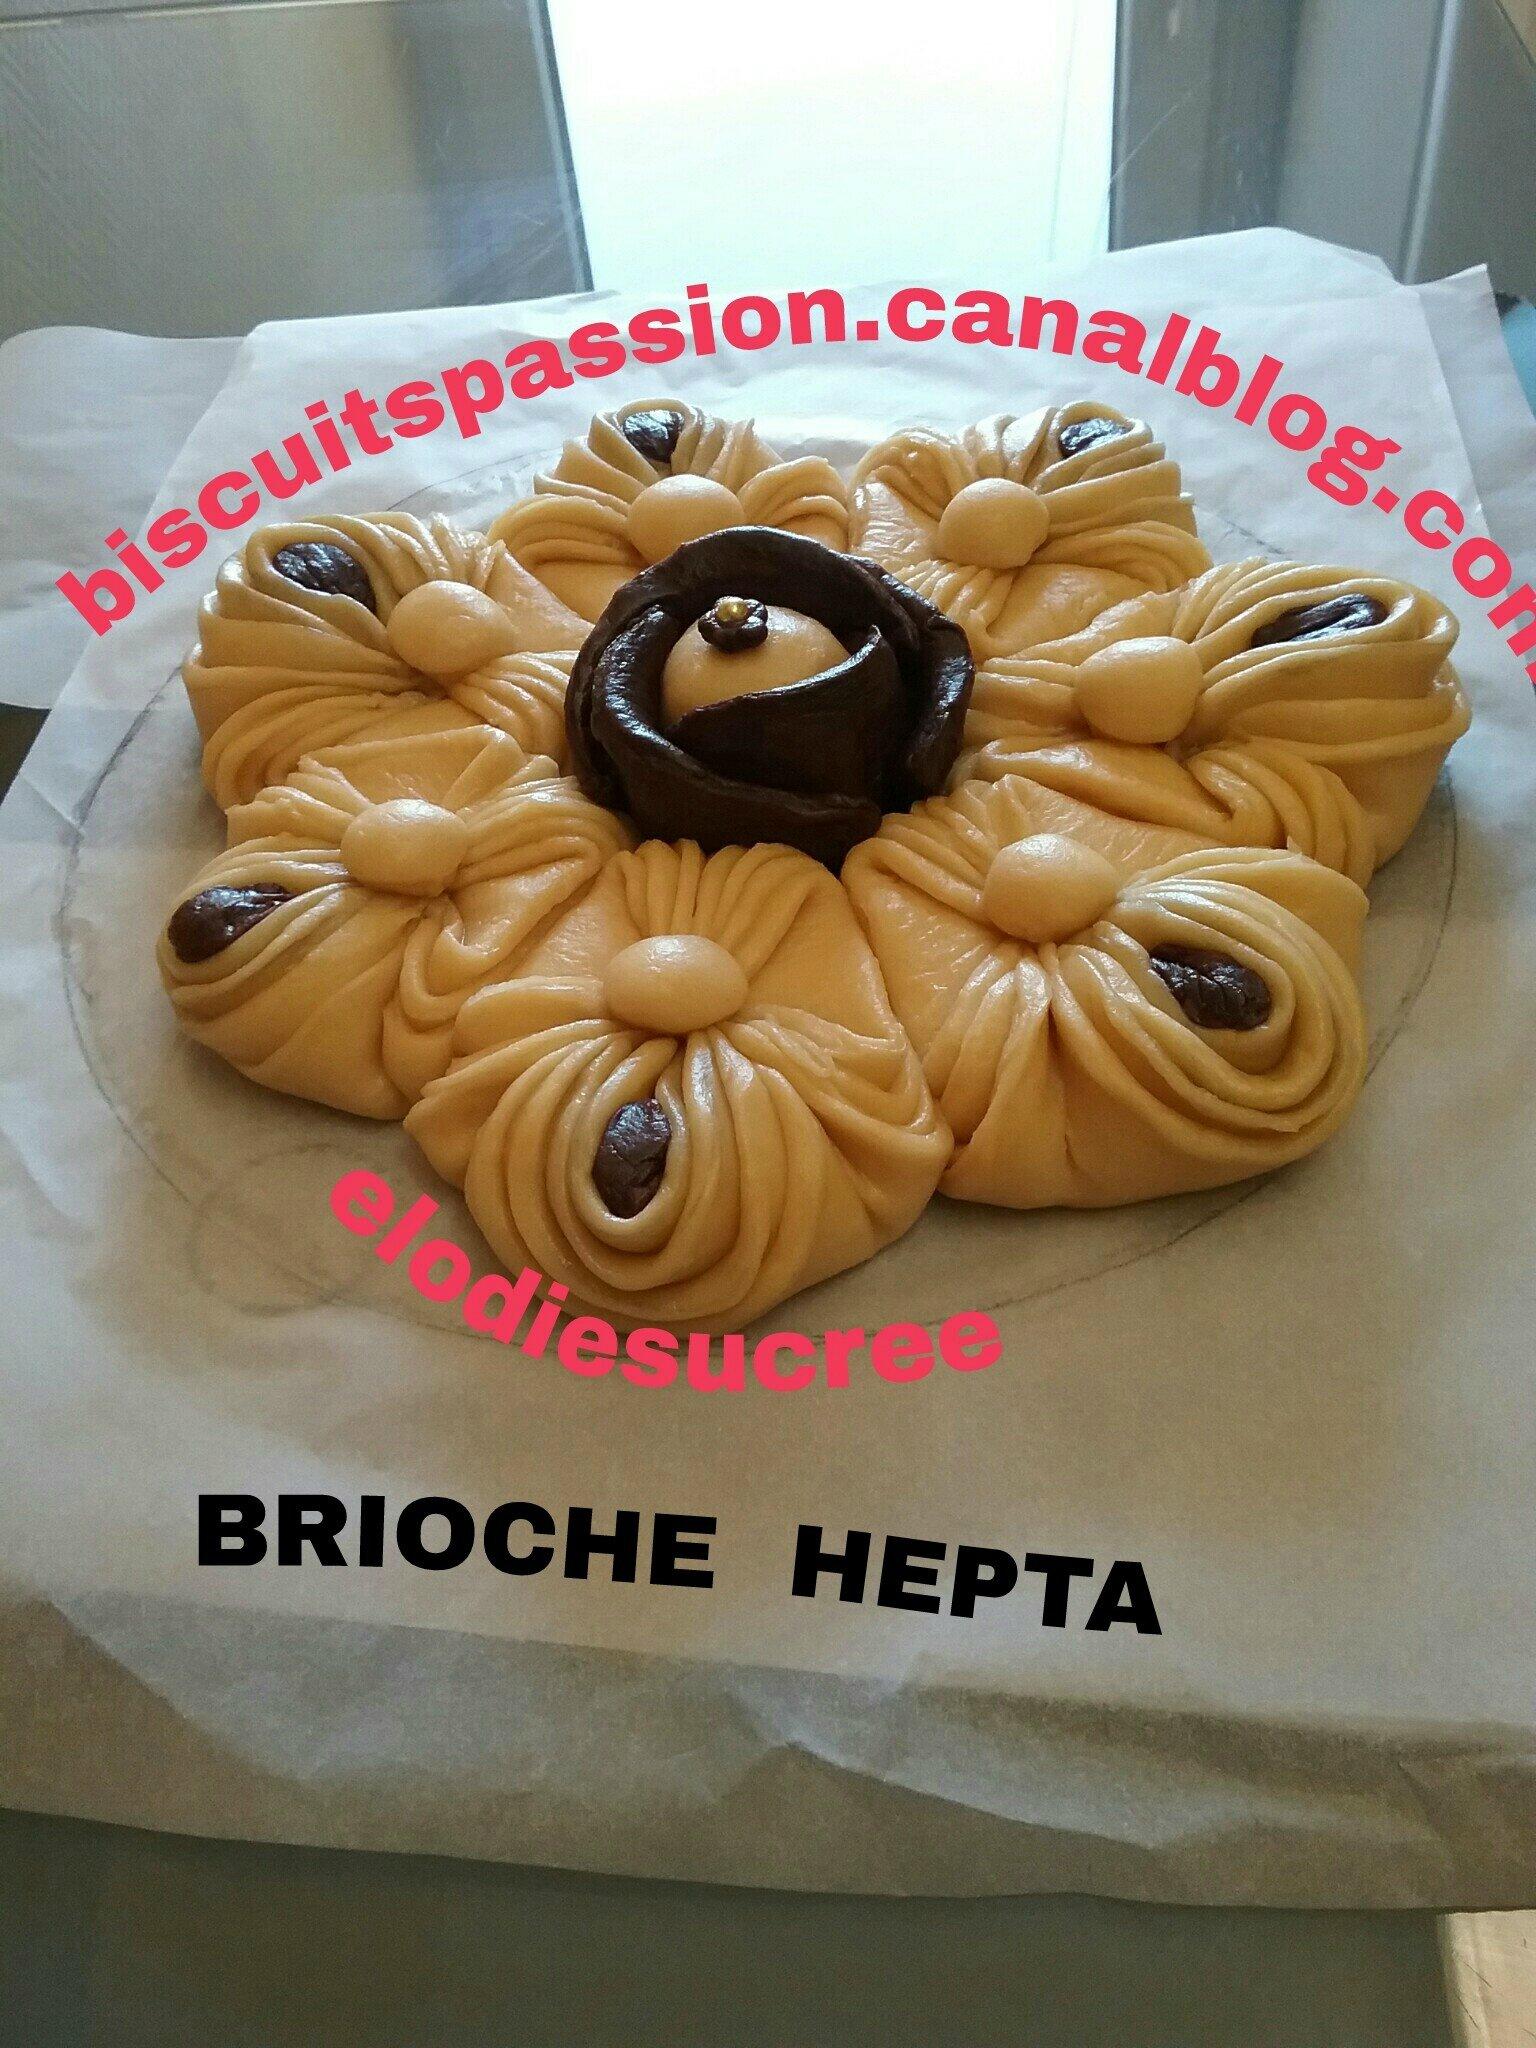 BRIOCHE HEPTA